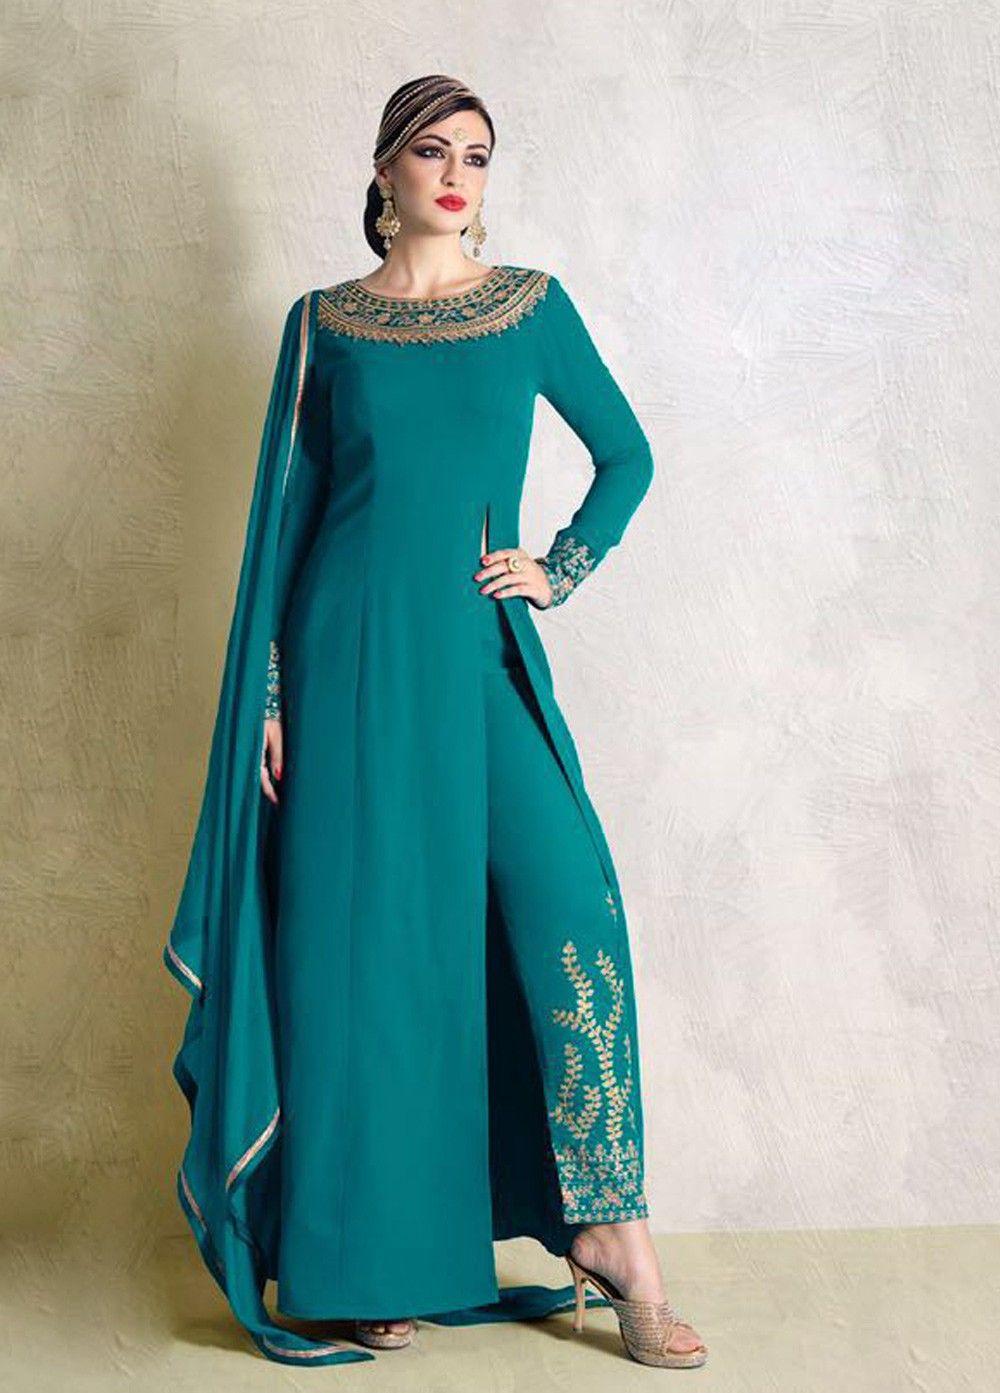 Impeccable Blue Crape #Partywear #SalwarSuit #womenwear #ethnicwear ...